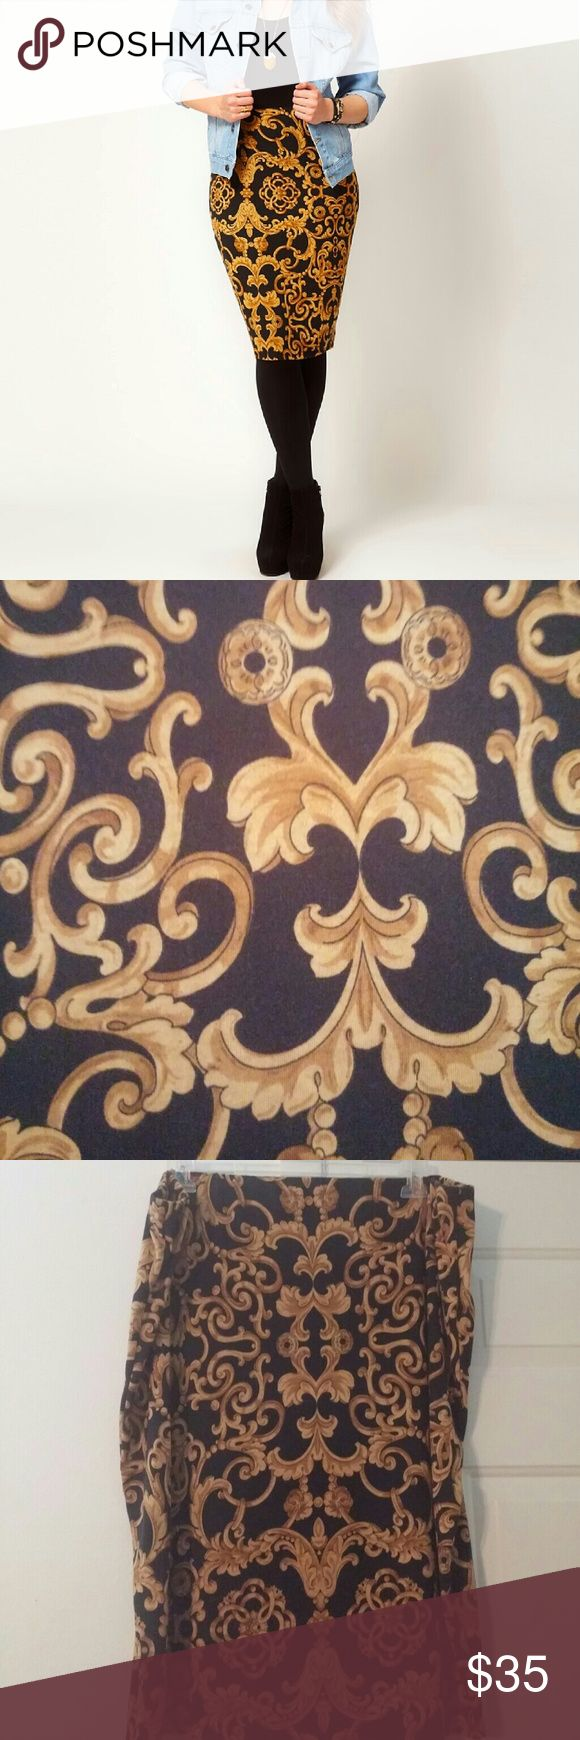 ASOS Curve Skirt ASOS Curve Baroque Chain Printed Skirt...elastic waist...UK 26/US 22 ASOS Curve Skirts Pencil